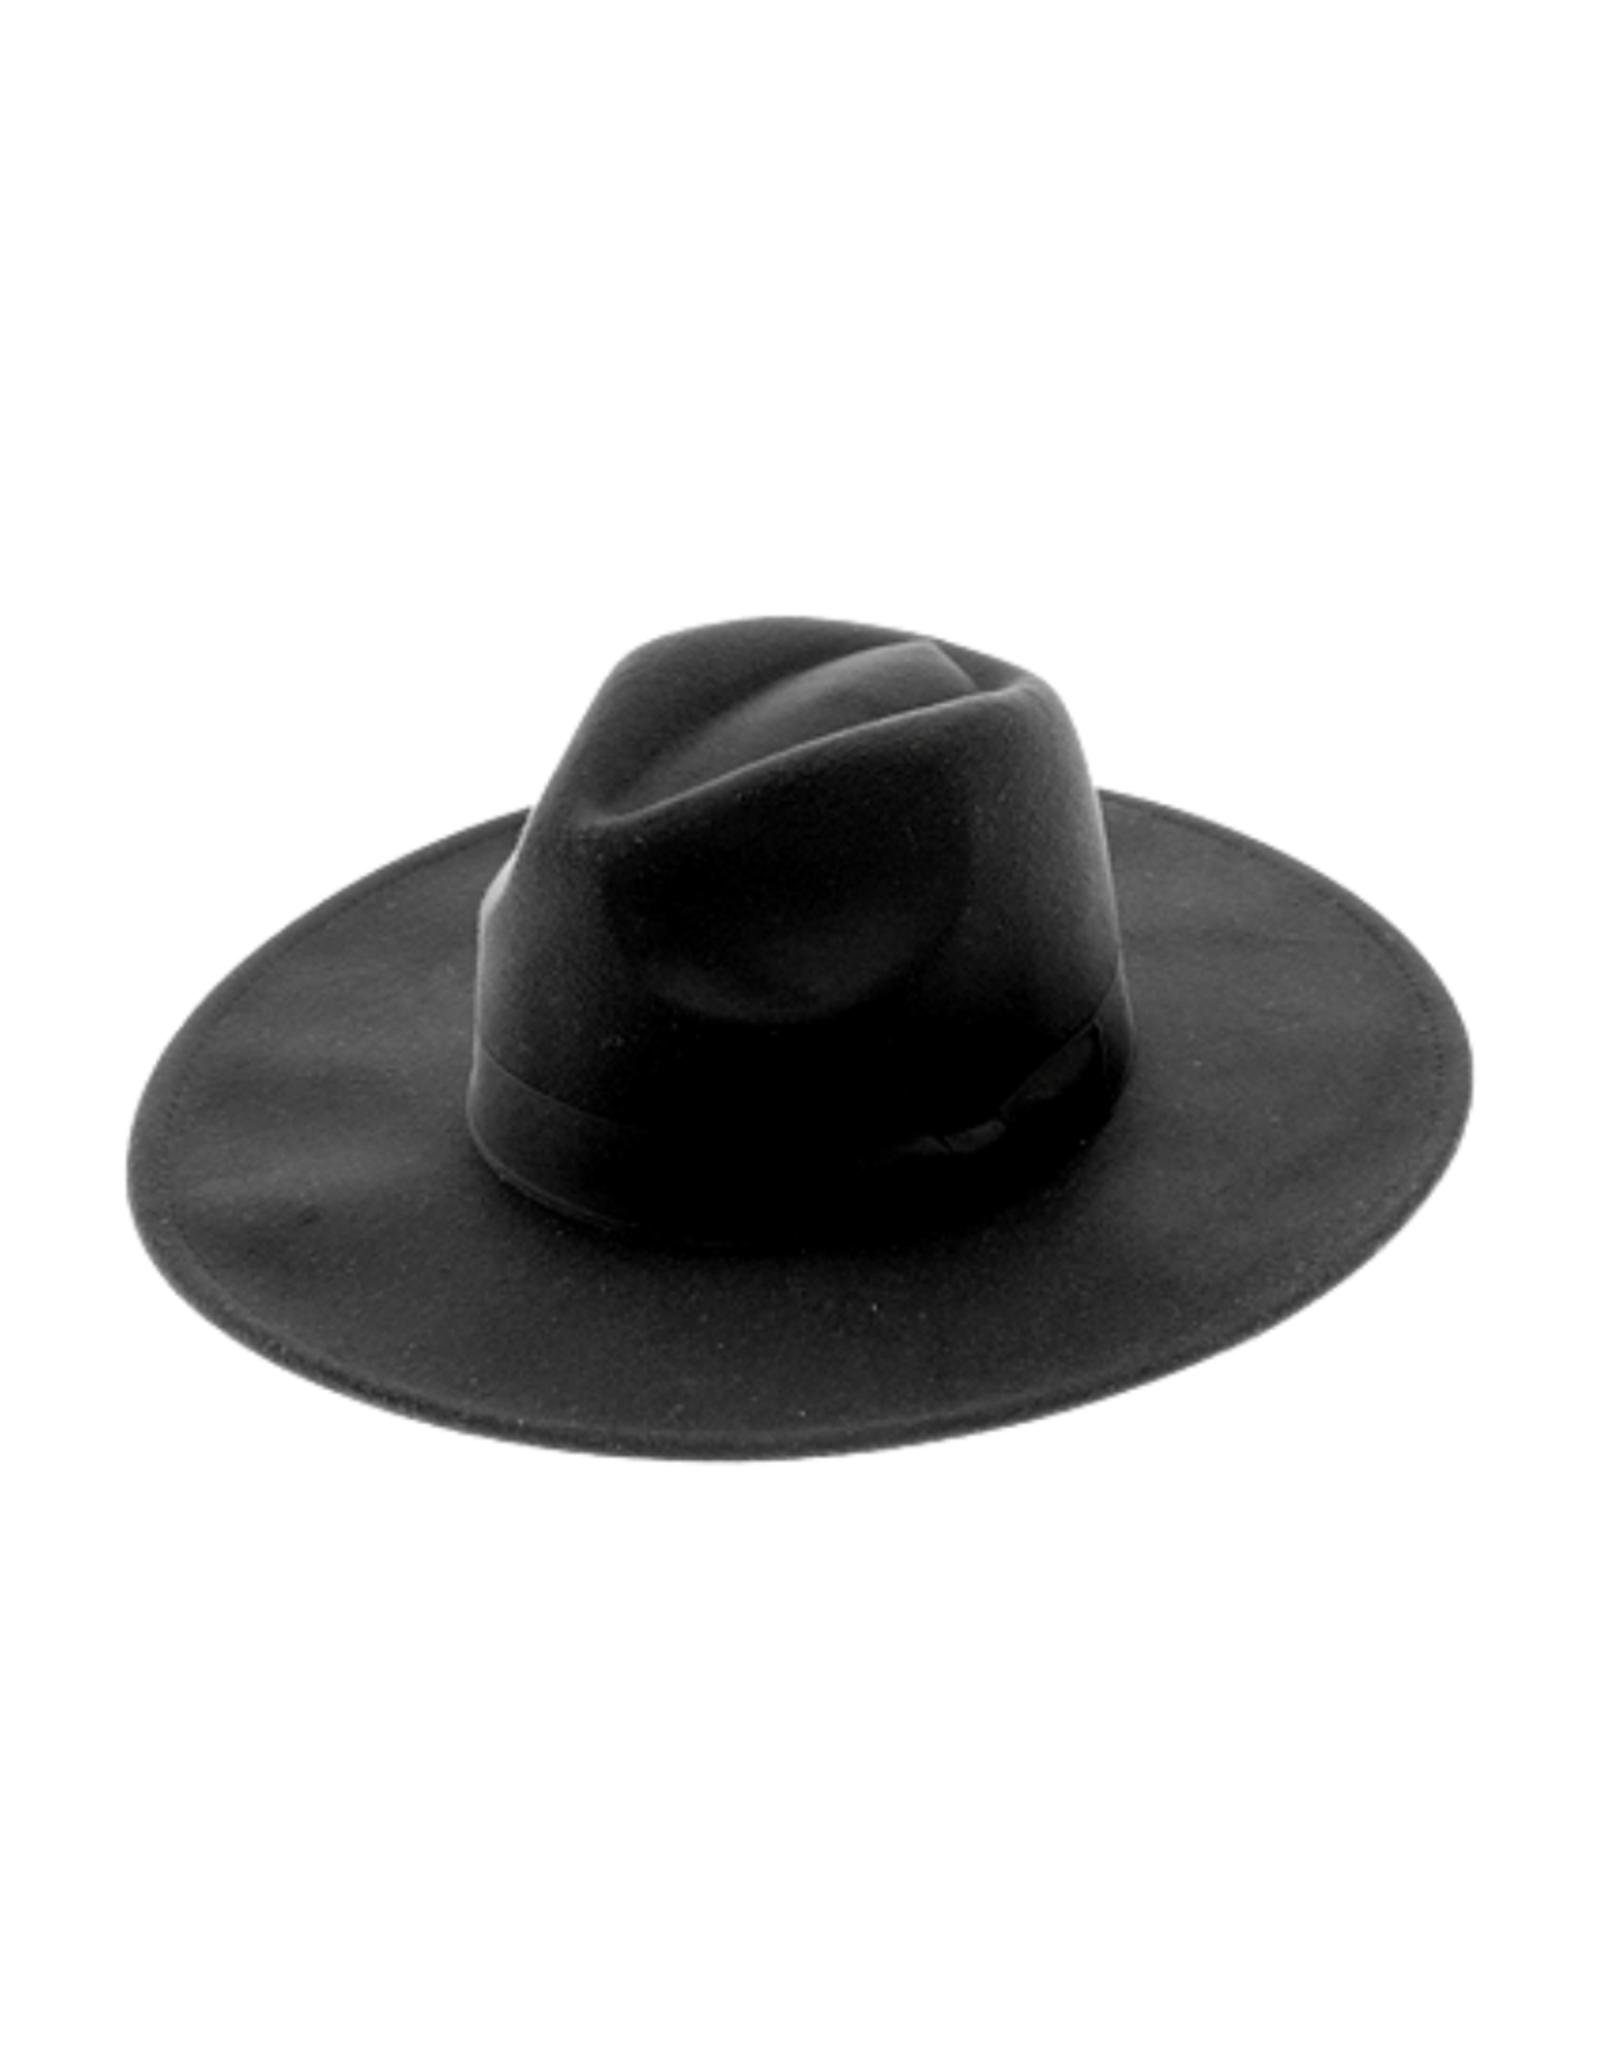 HAT-WIDE BRIM-FEDORA ,FELT